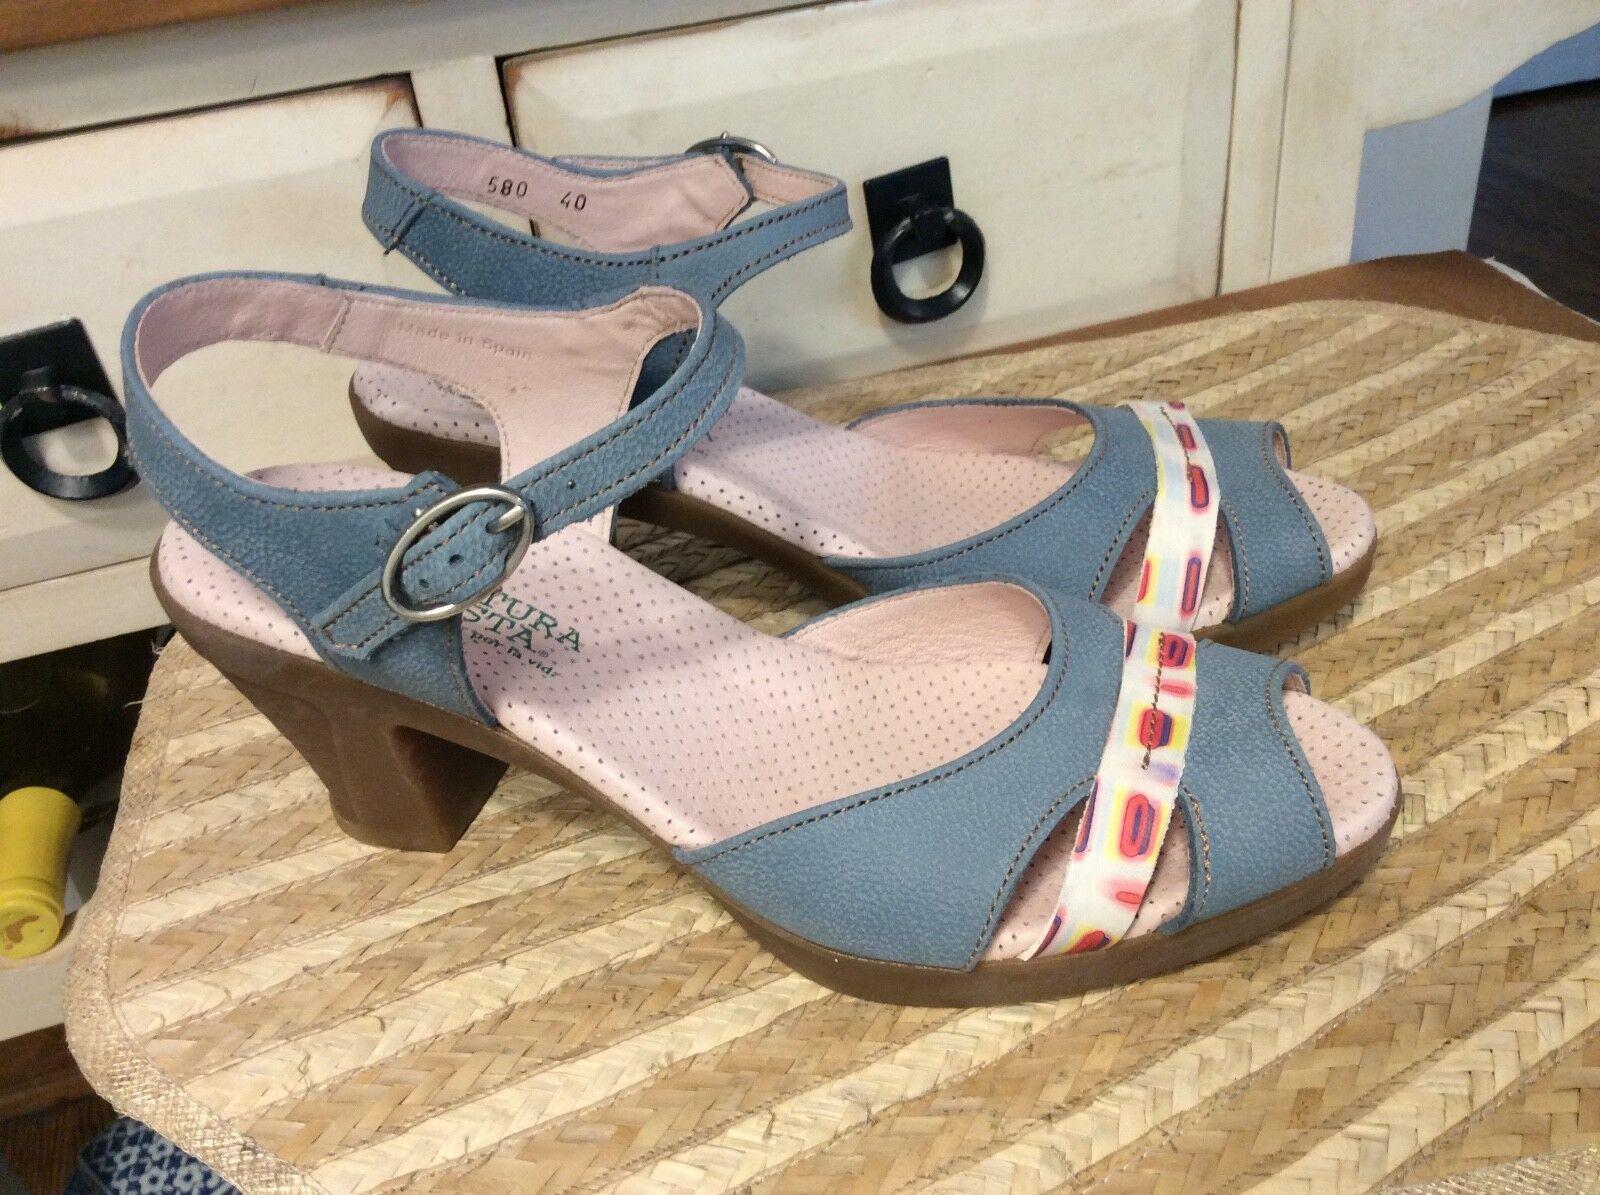 El naturalista mujer 580 Tobillo con Tiras Sandalia Zapato Zapato Zapato Puntera Abierta Azul Talla 40 - 9-9... 5  selección larga